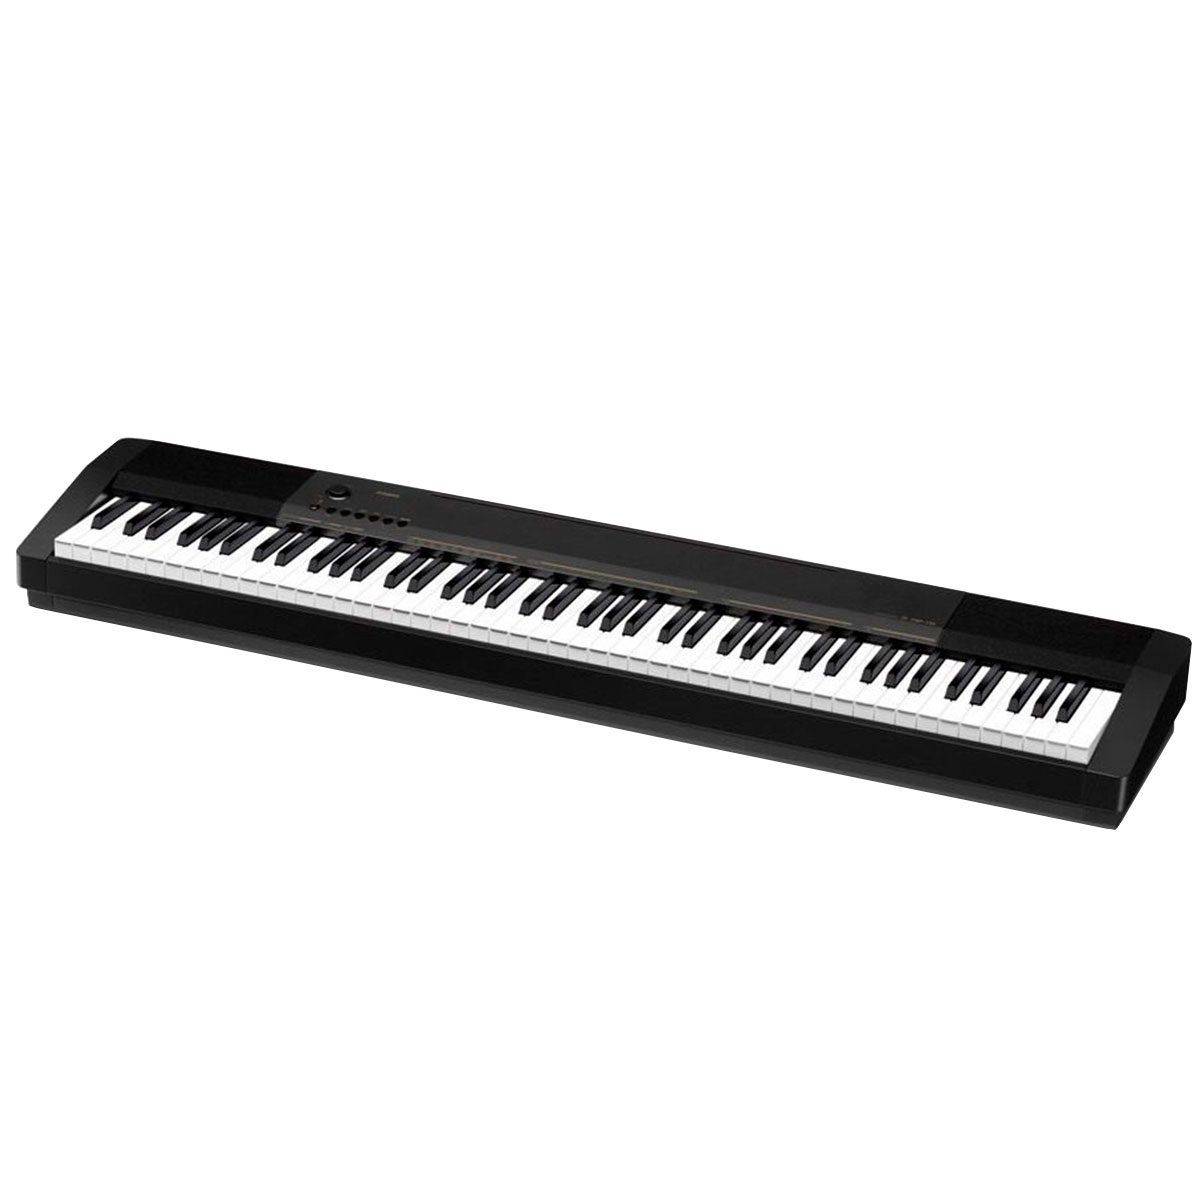 CDP130BK - Piano Digital 88 Teclas CDP 130 BK - Casio